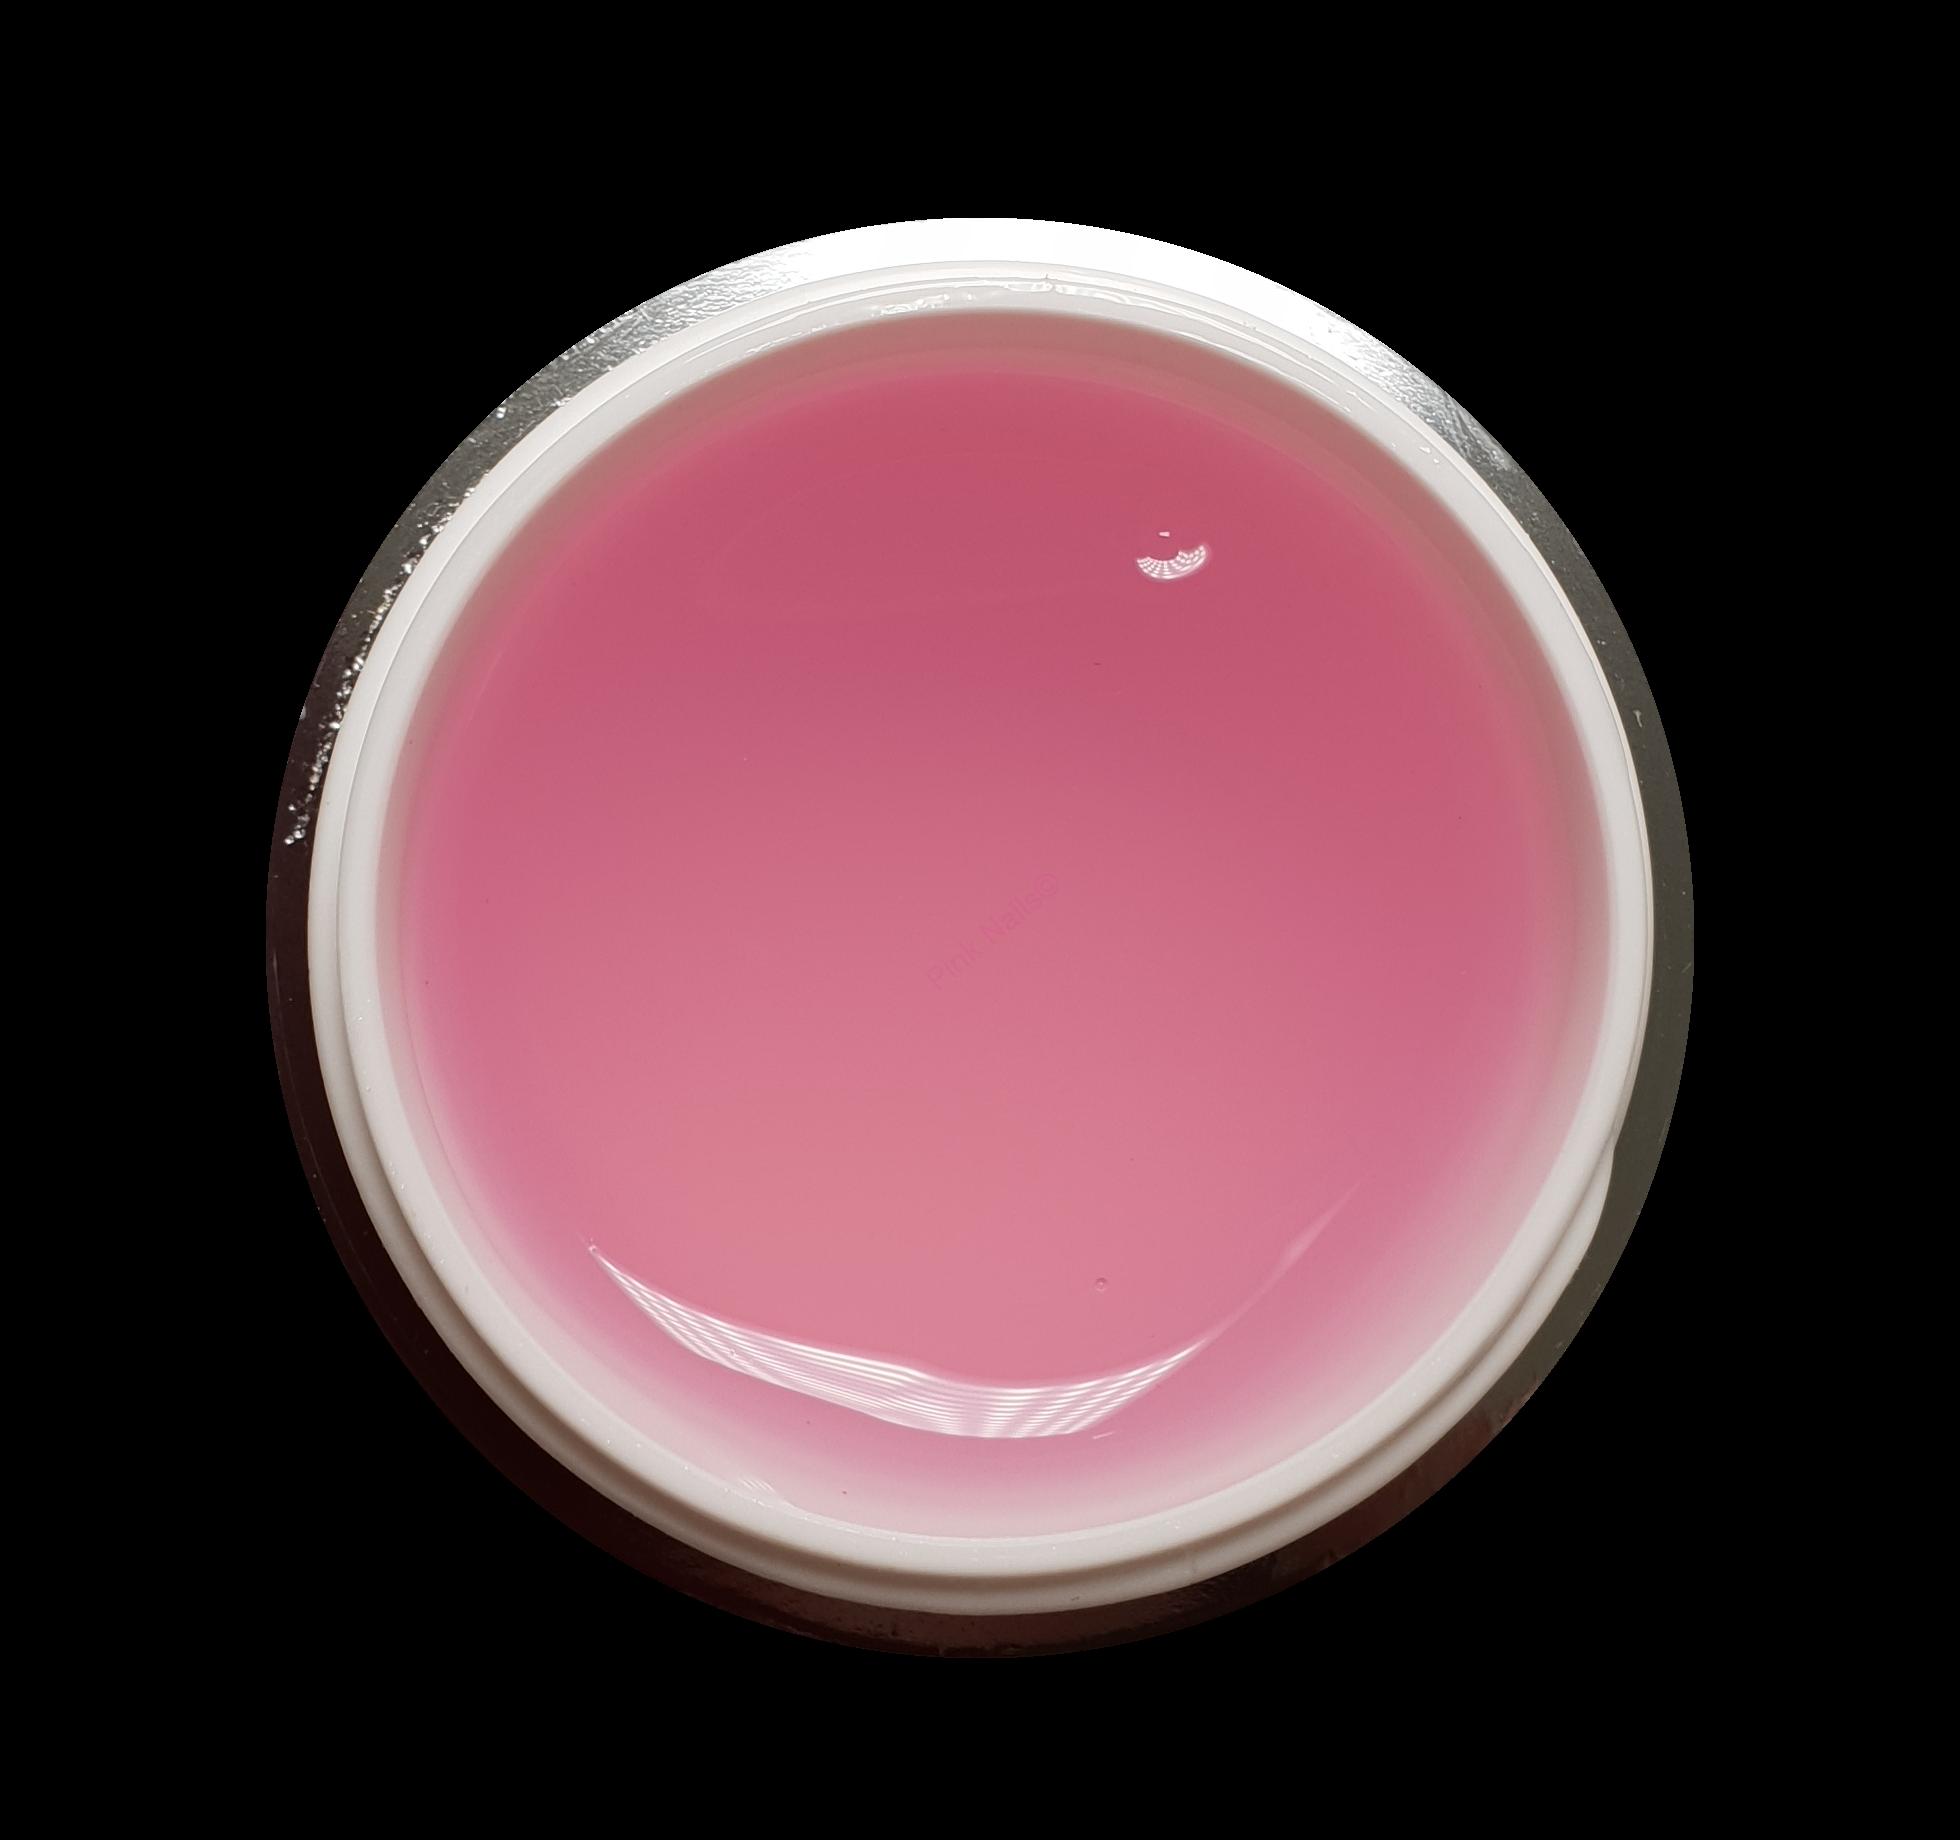 Uv Gel Pink Clear Jednofazovy 5ml Produkty Pro Nehtovy Design